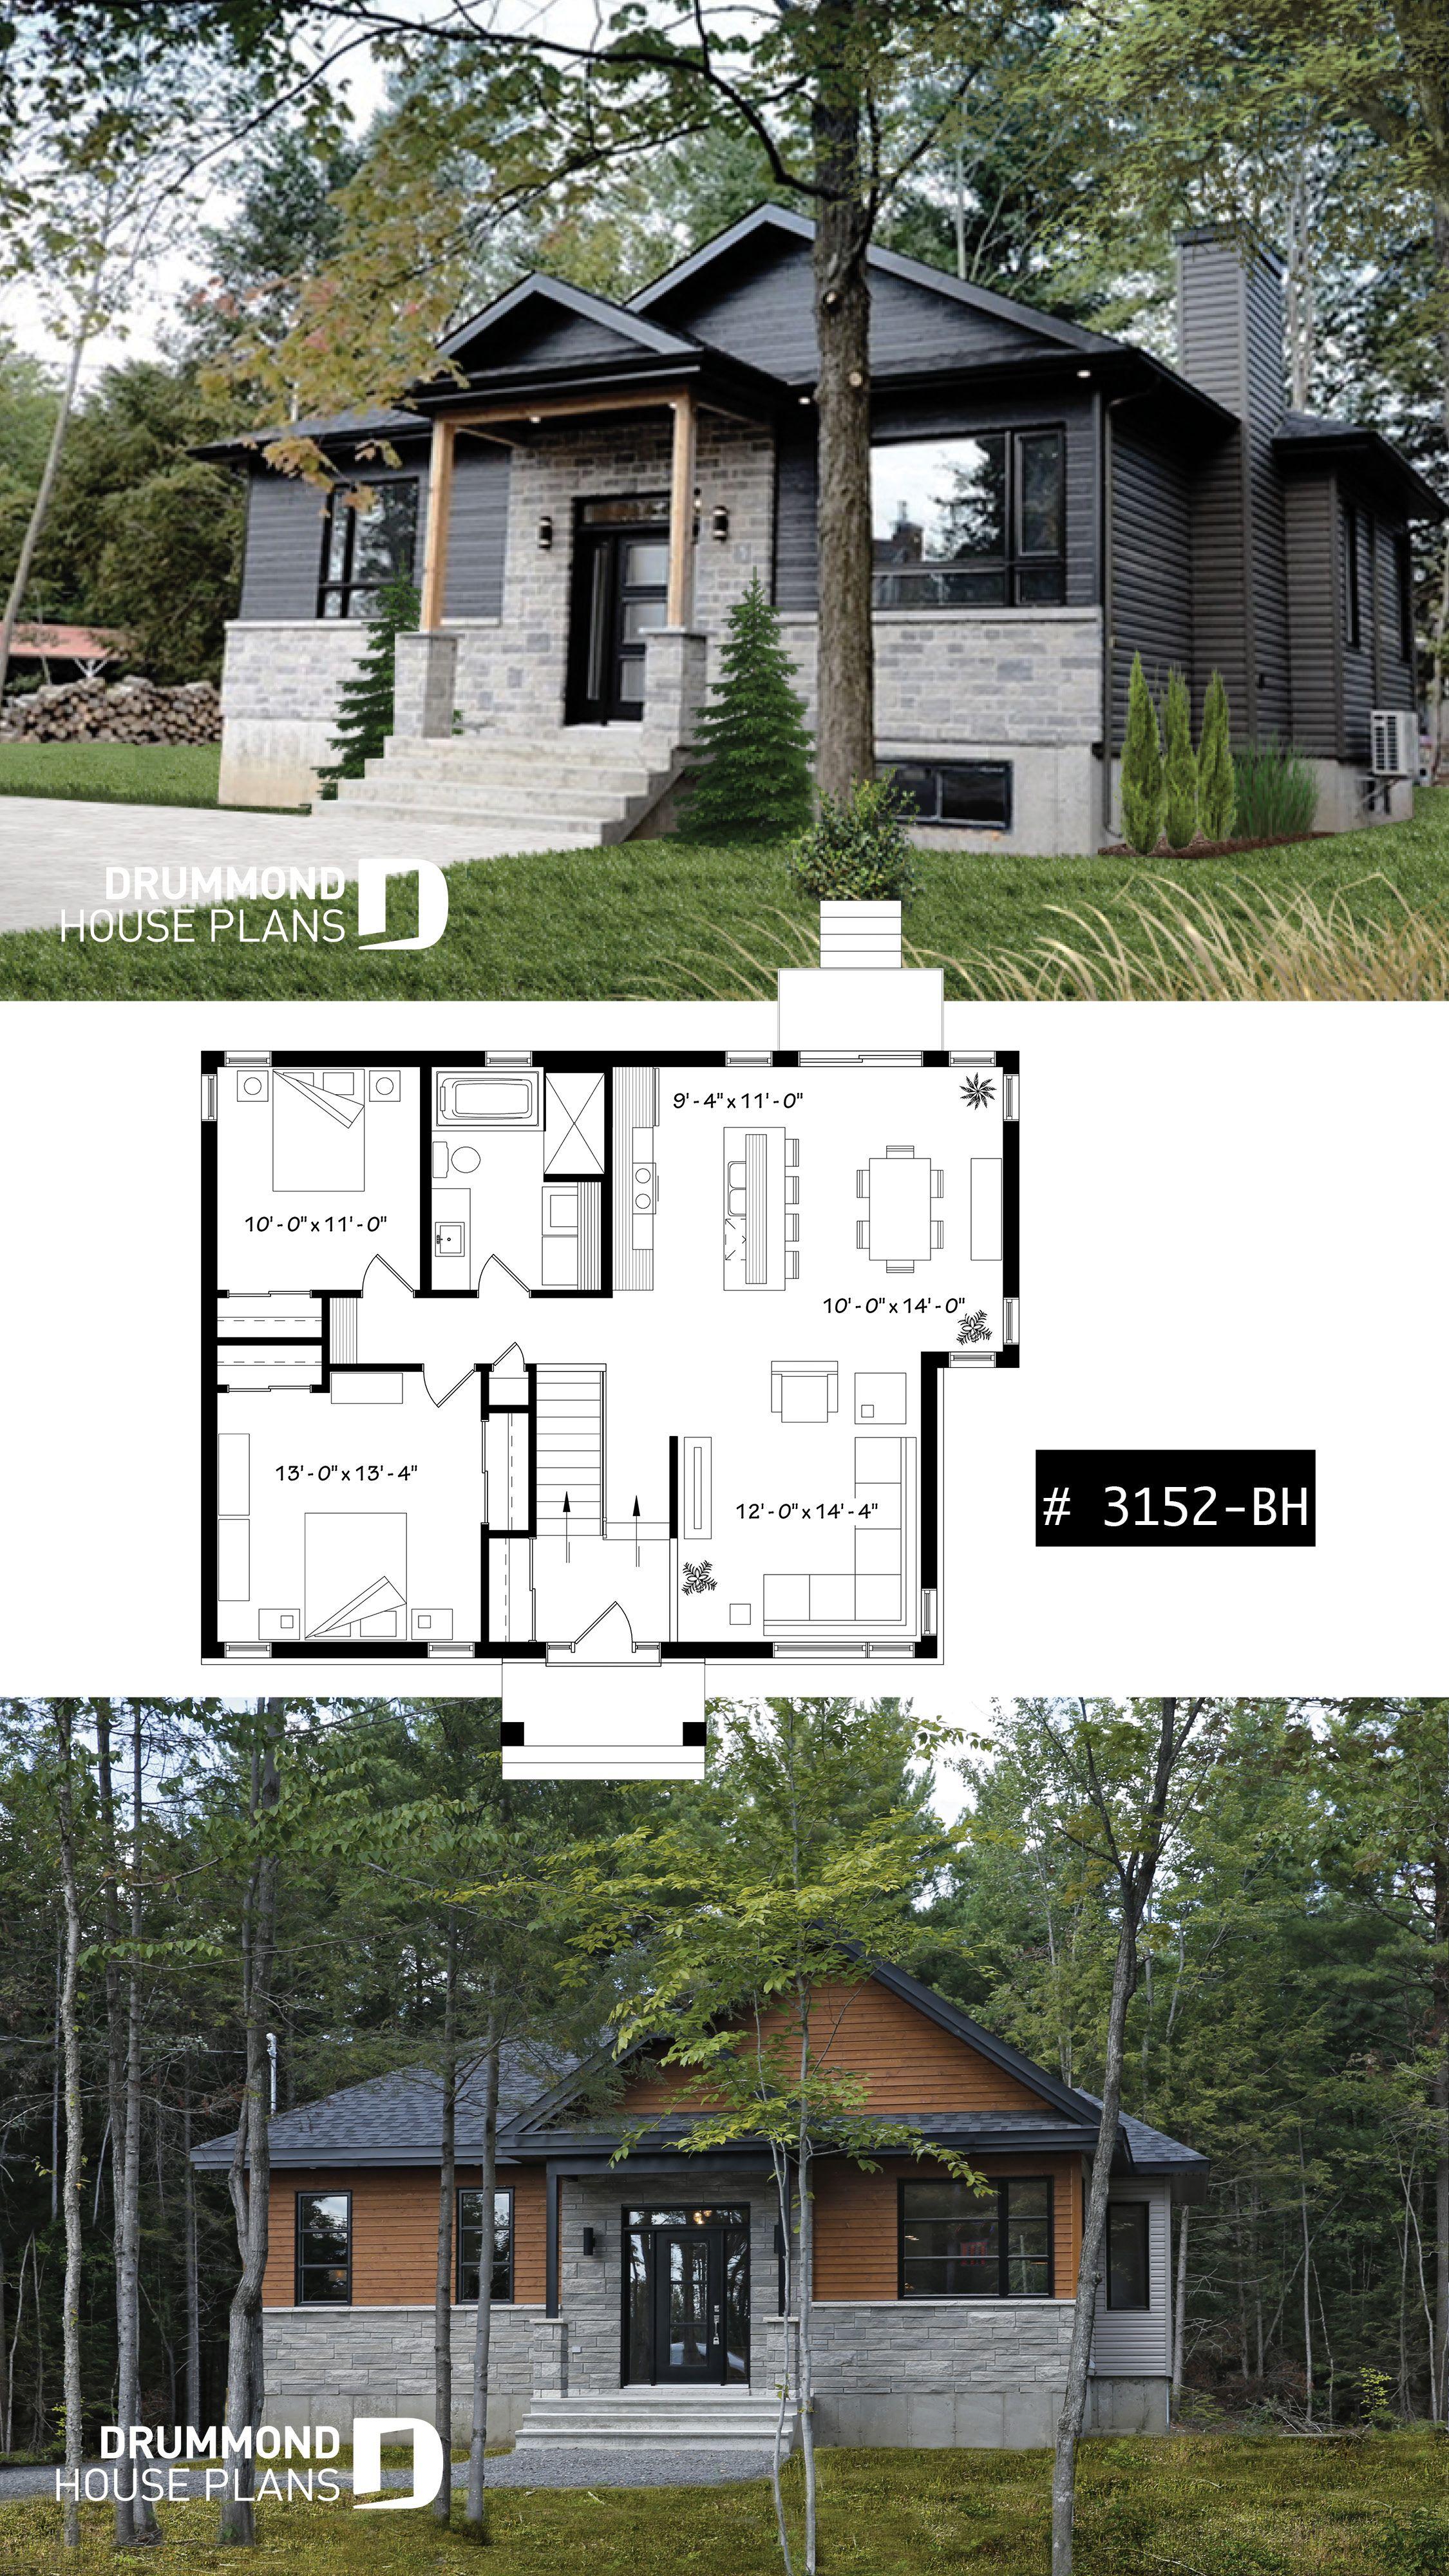 2 Bedroom Rustic Modern Home Plan Split Entry Large Kitchen Island Full Bathroom